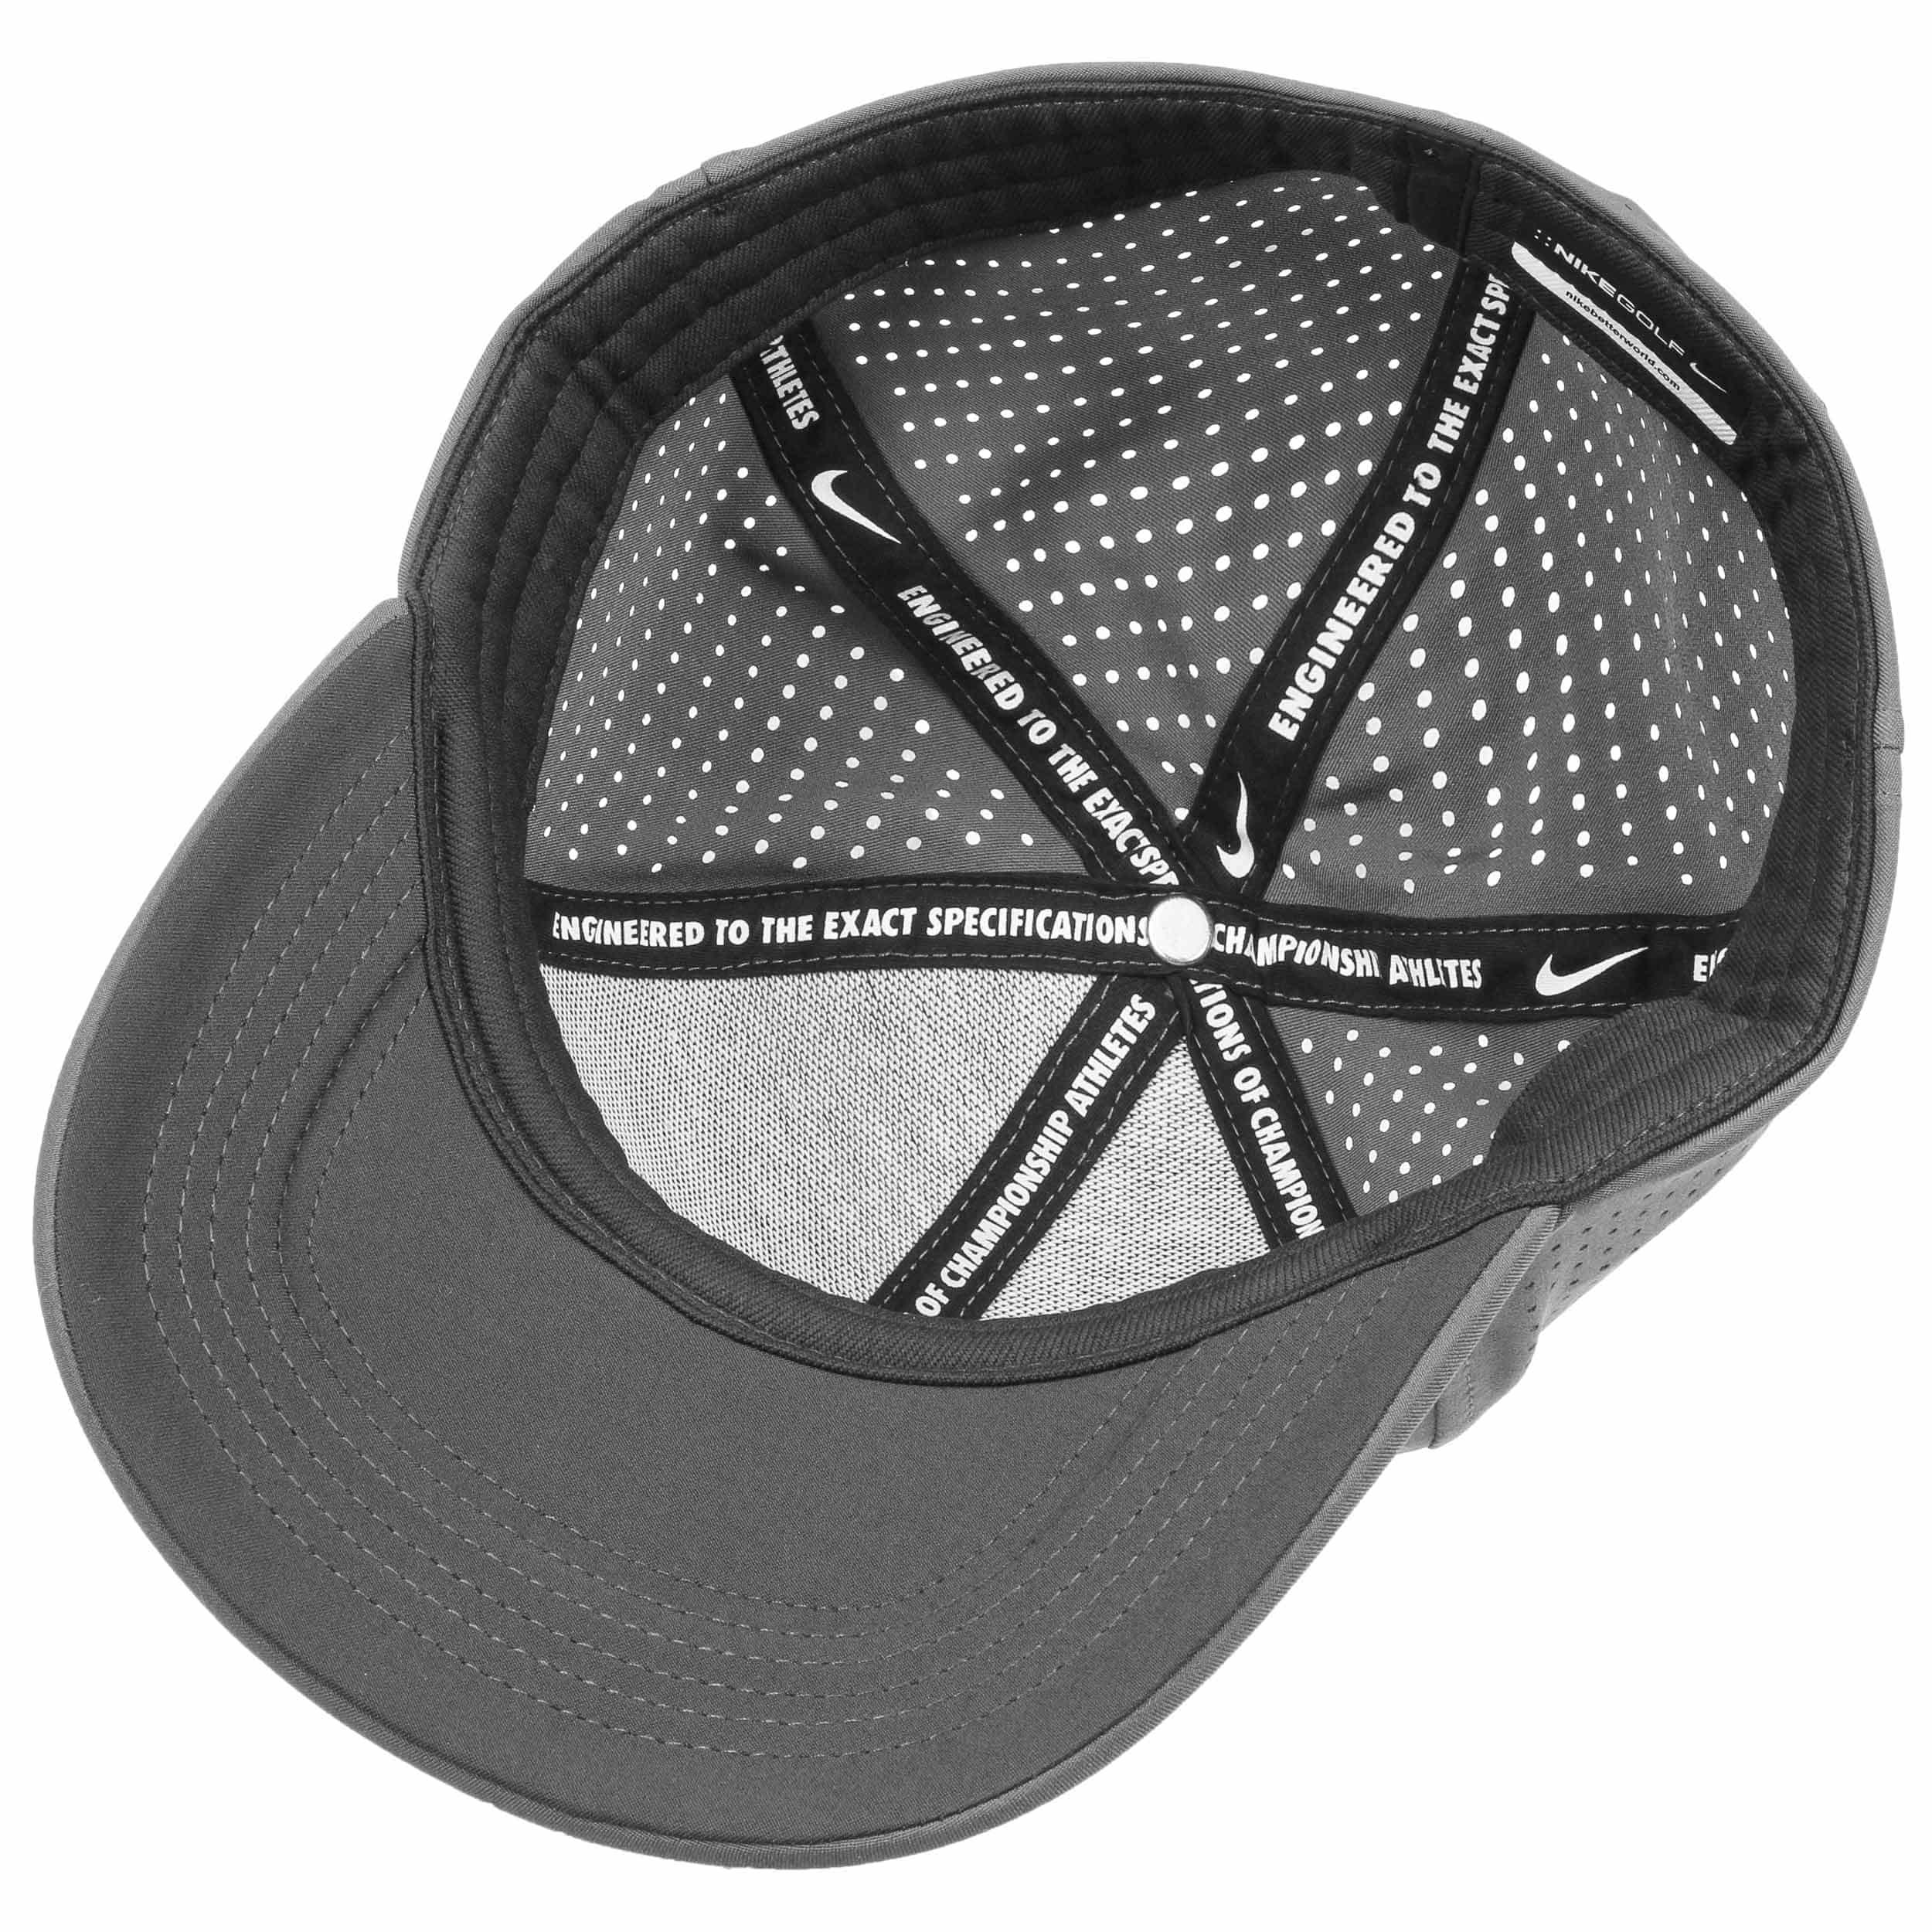 ... Golf Classic 99 Baseball Cap by Nike - grey 2 ... 0c5377a9b1d